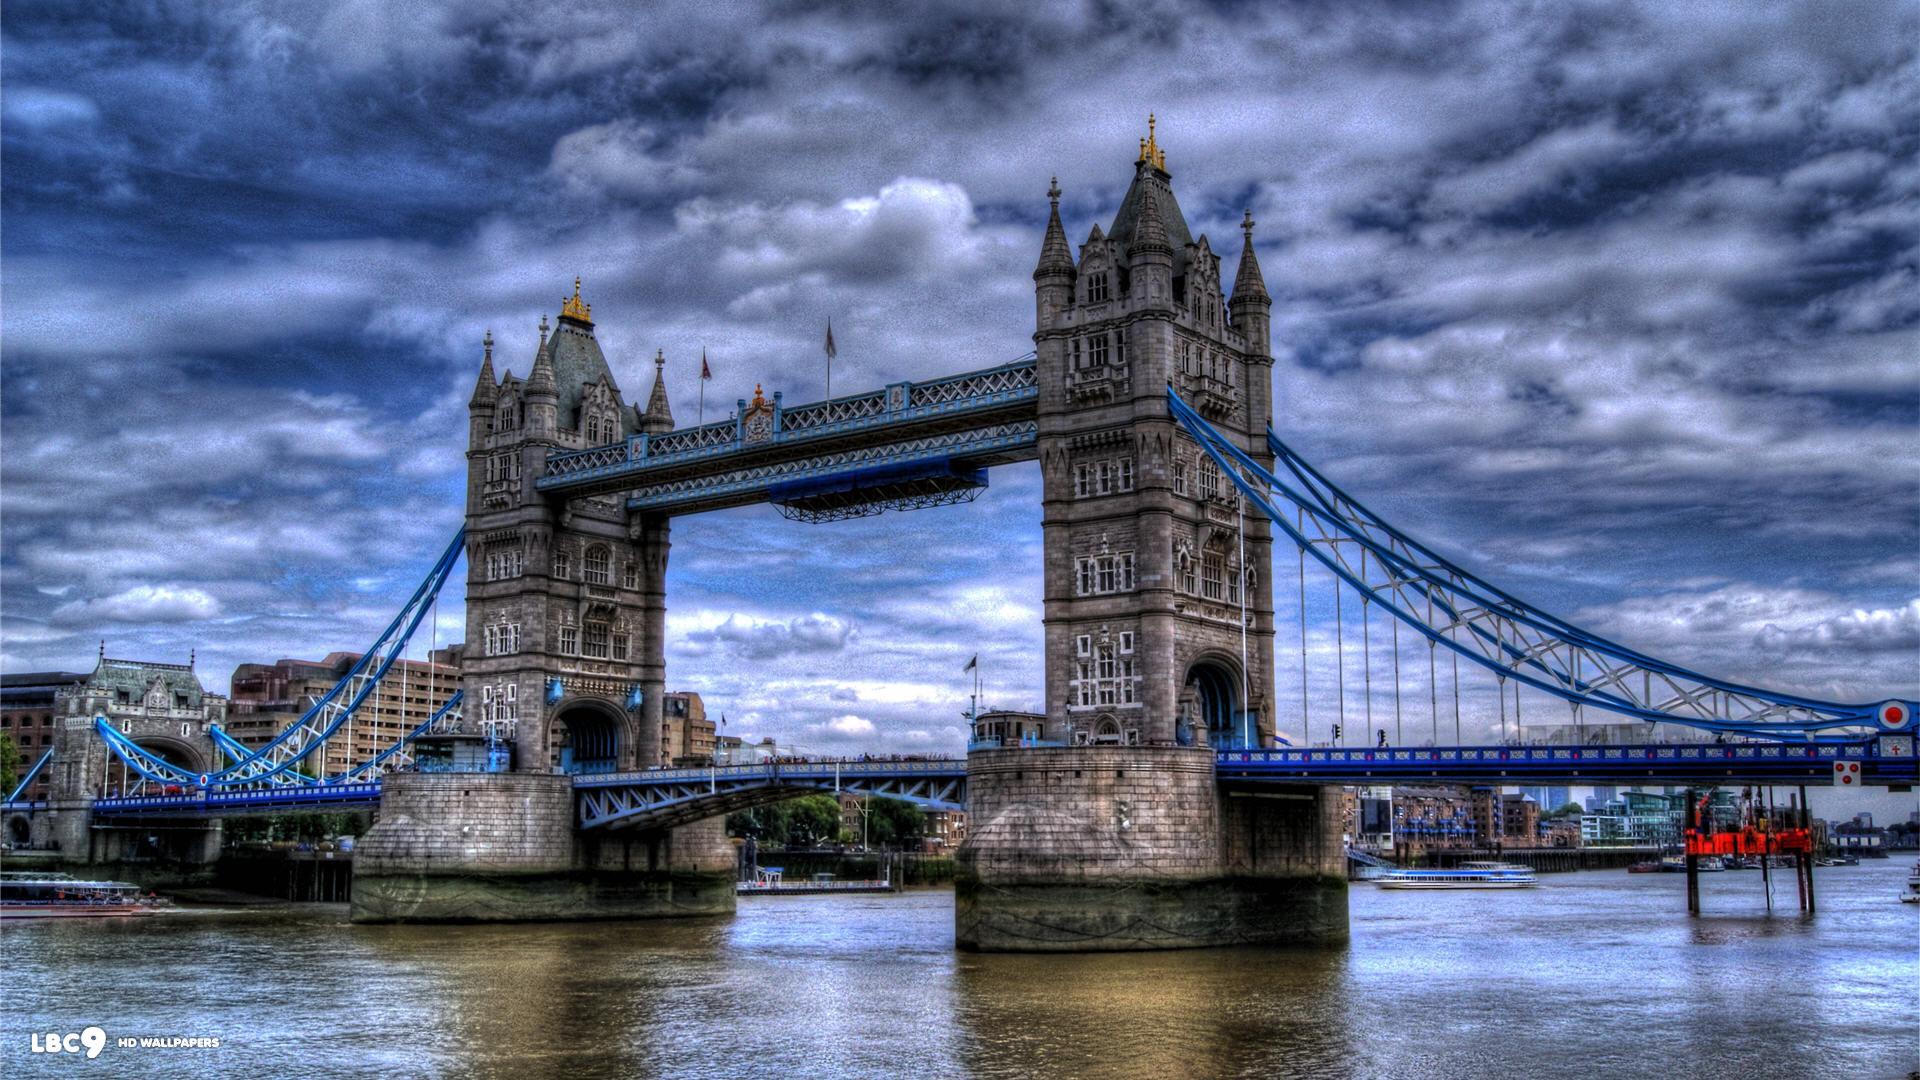 Hd Wallpaper Tower Bridge